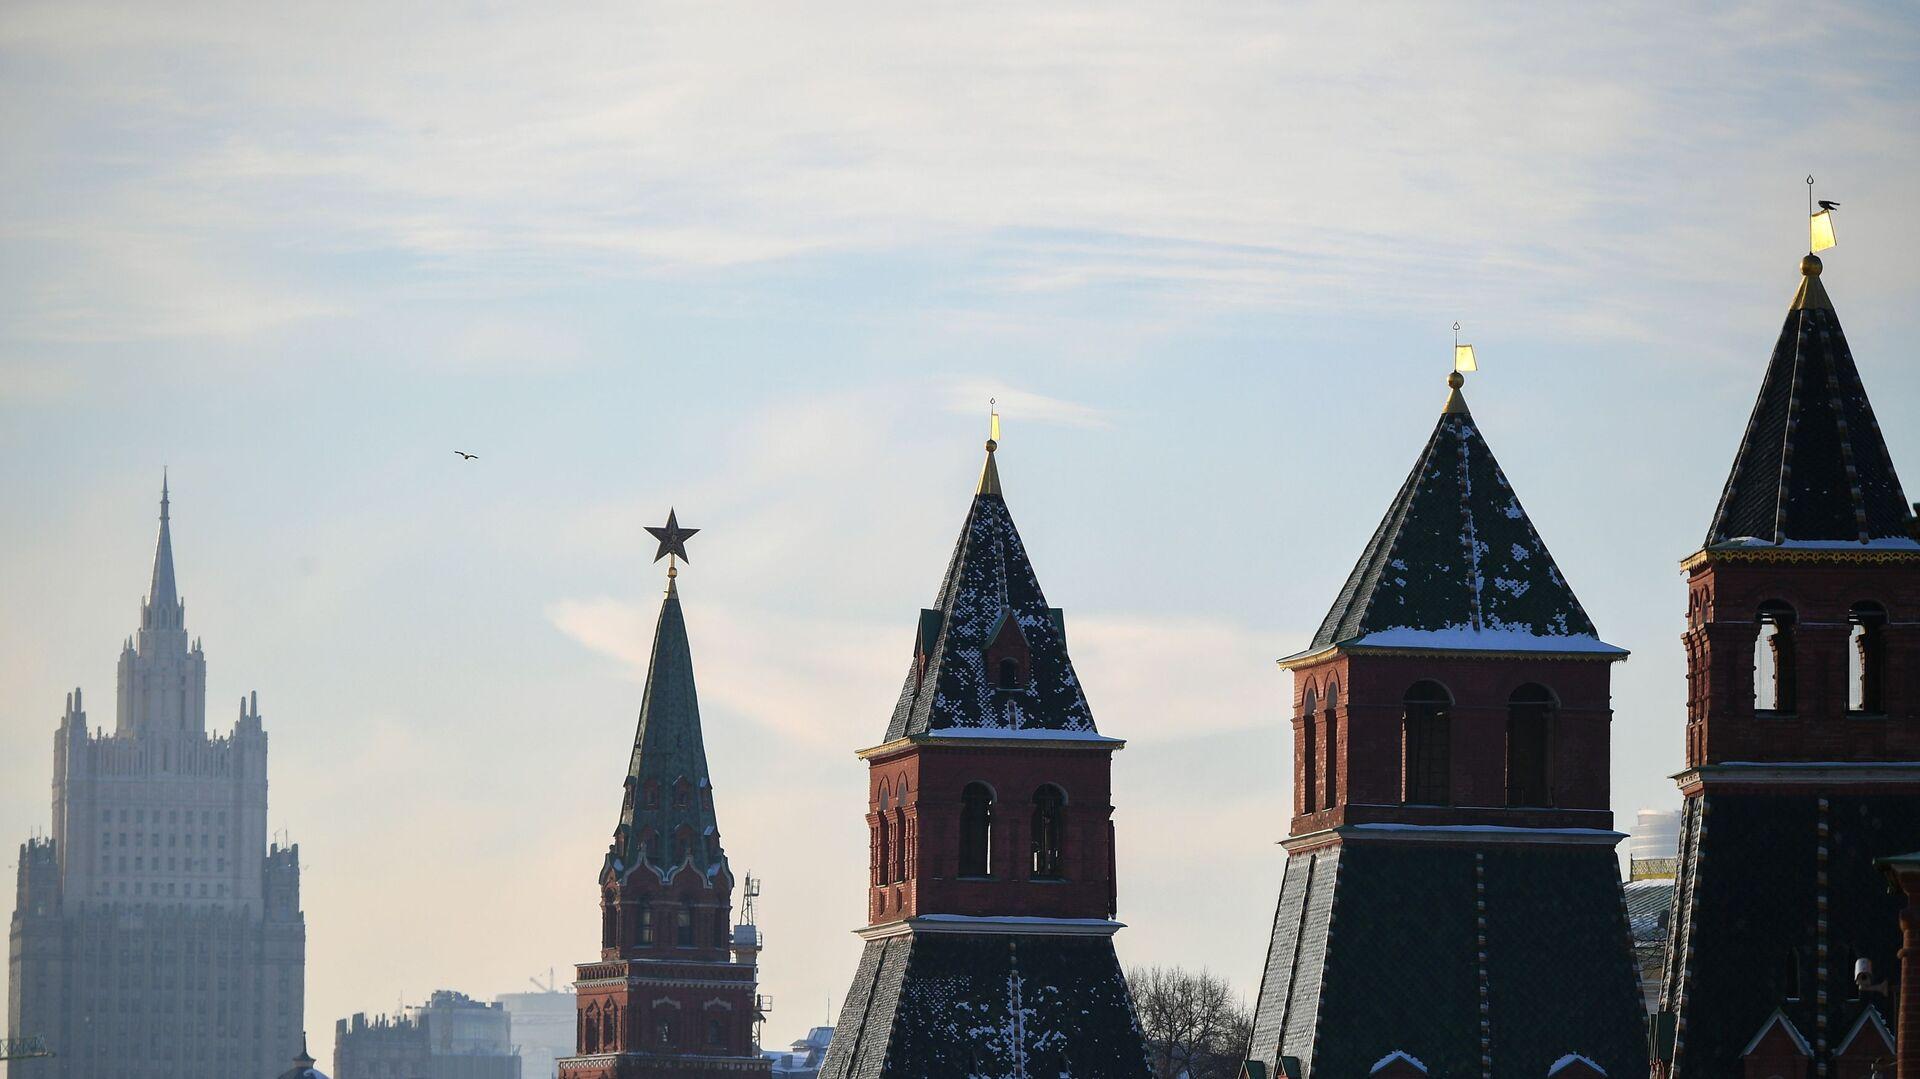 El Kremlin de Moscú, Rusia - Sputnik Mundo, 1920, 26.04.2021